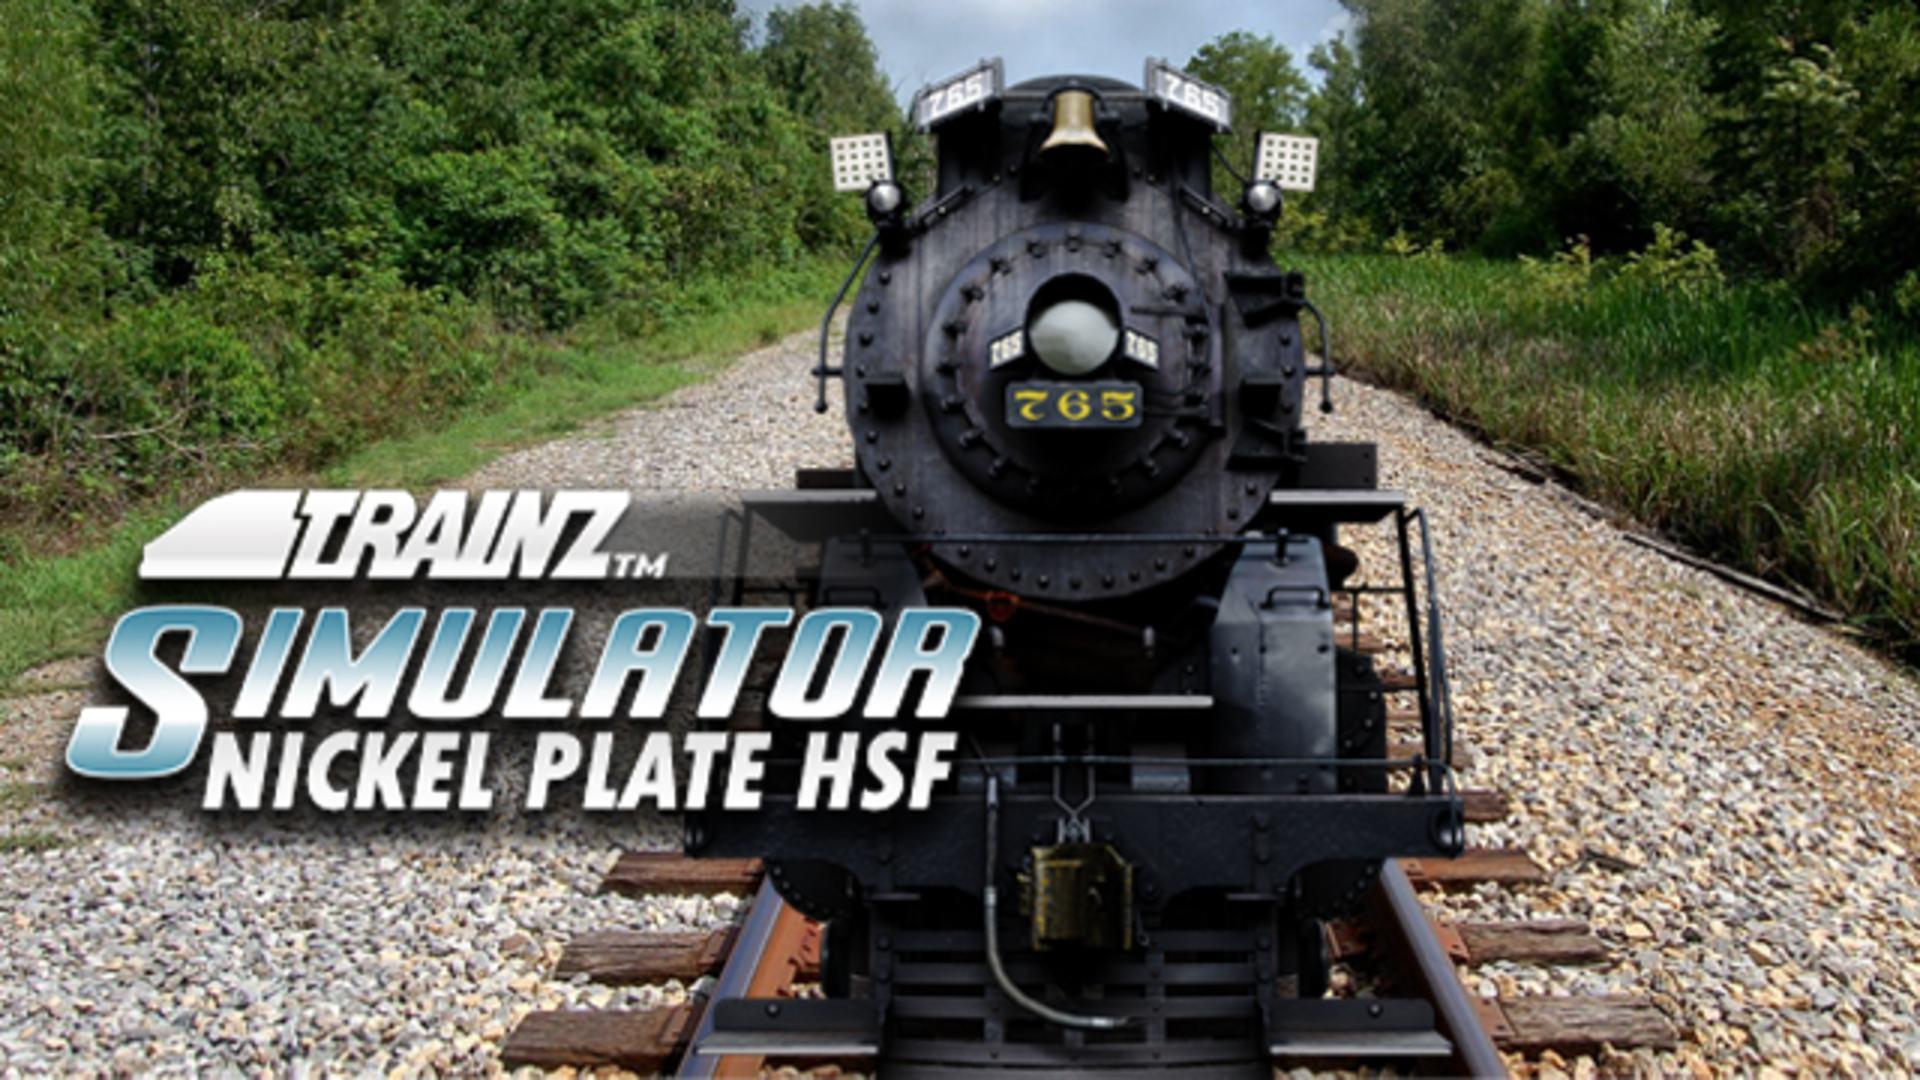 Trainz Simulator DLC: Nickel Plate High Speed Freight Set | PC Steam